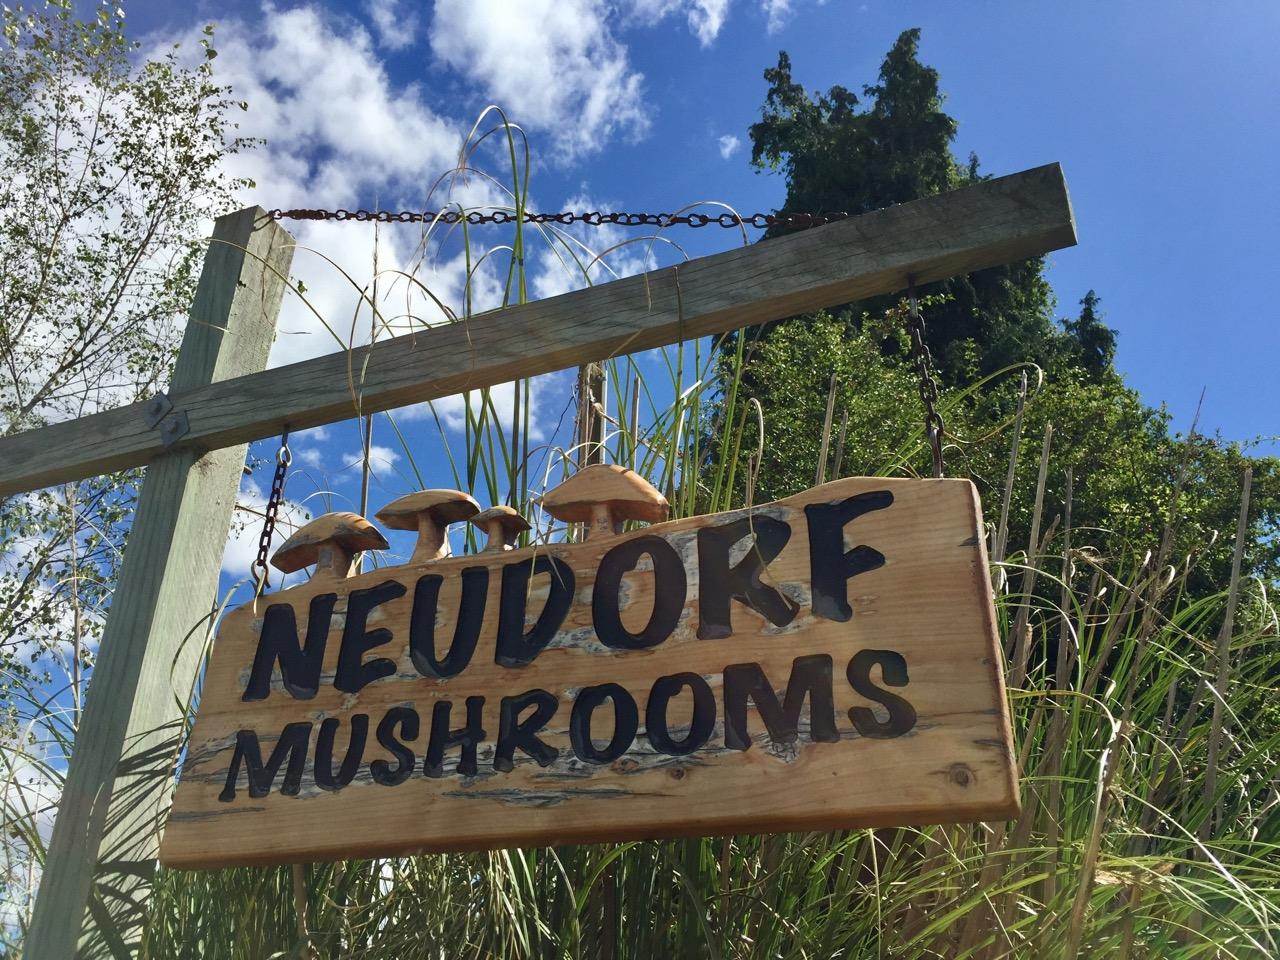 Neudorf mushrooms Moutere